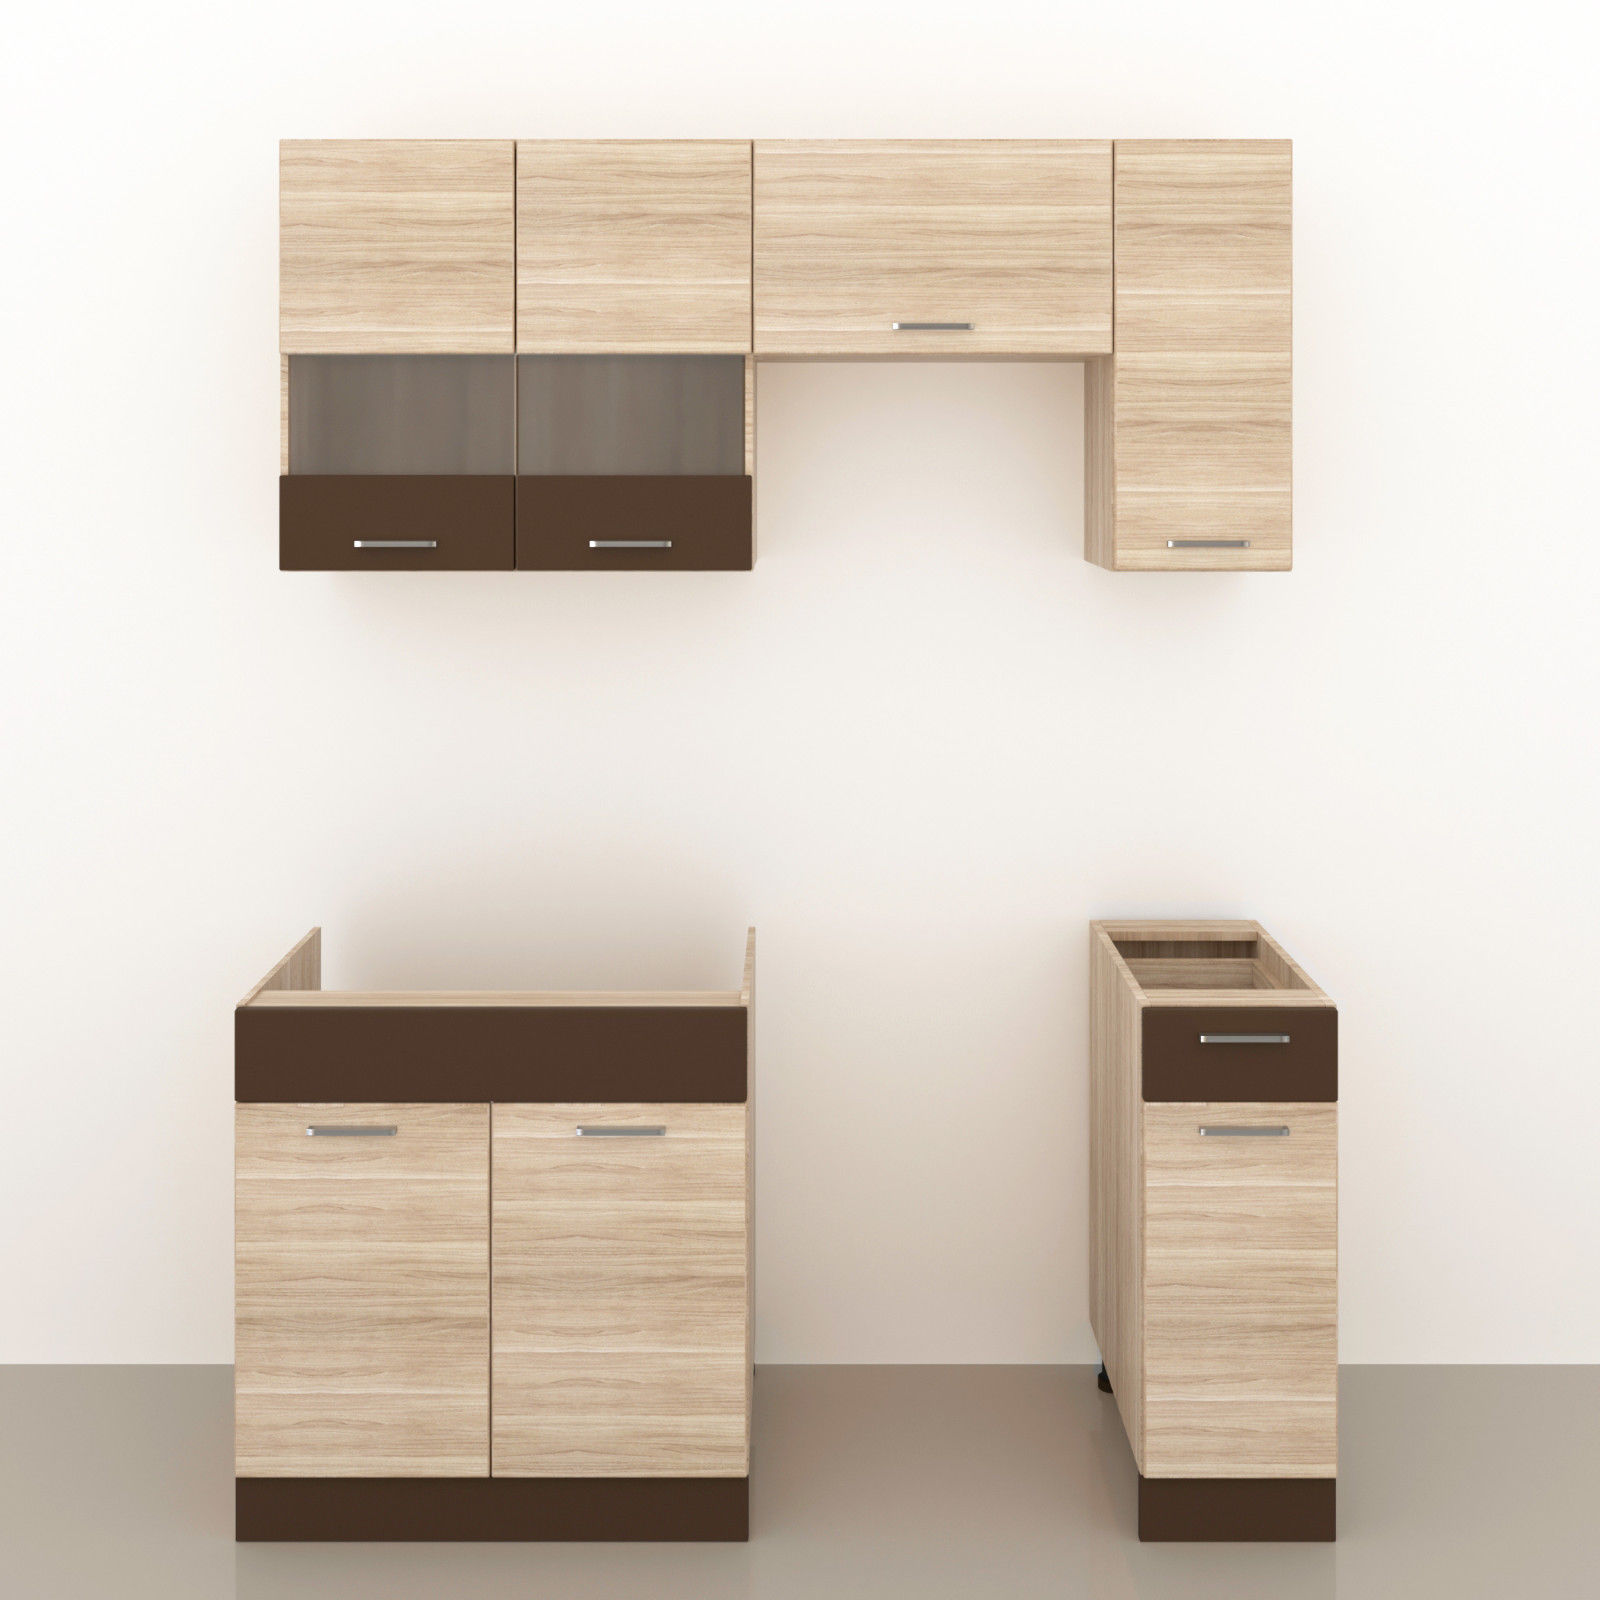 Küche ALINA 170 cm – Möbel DENA